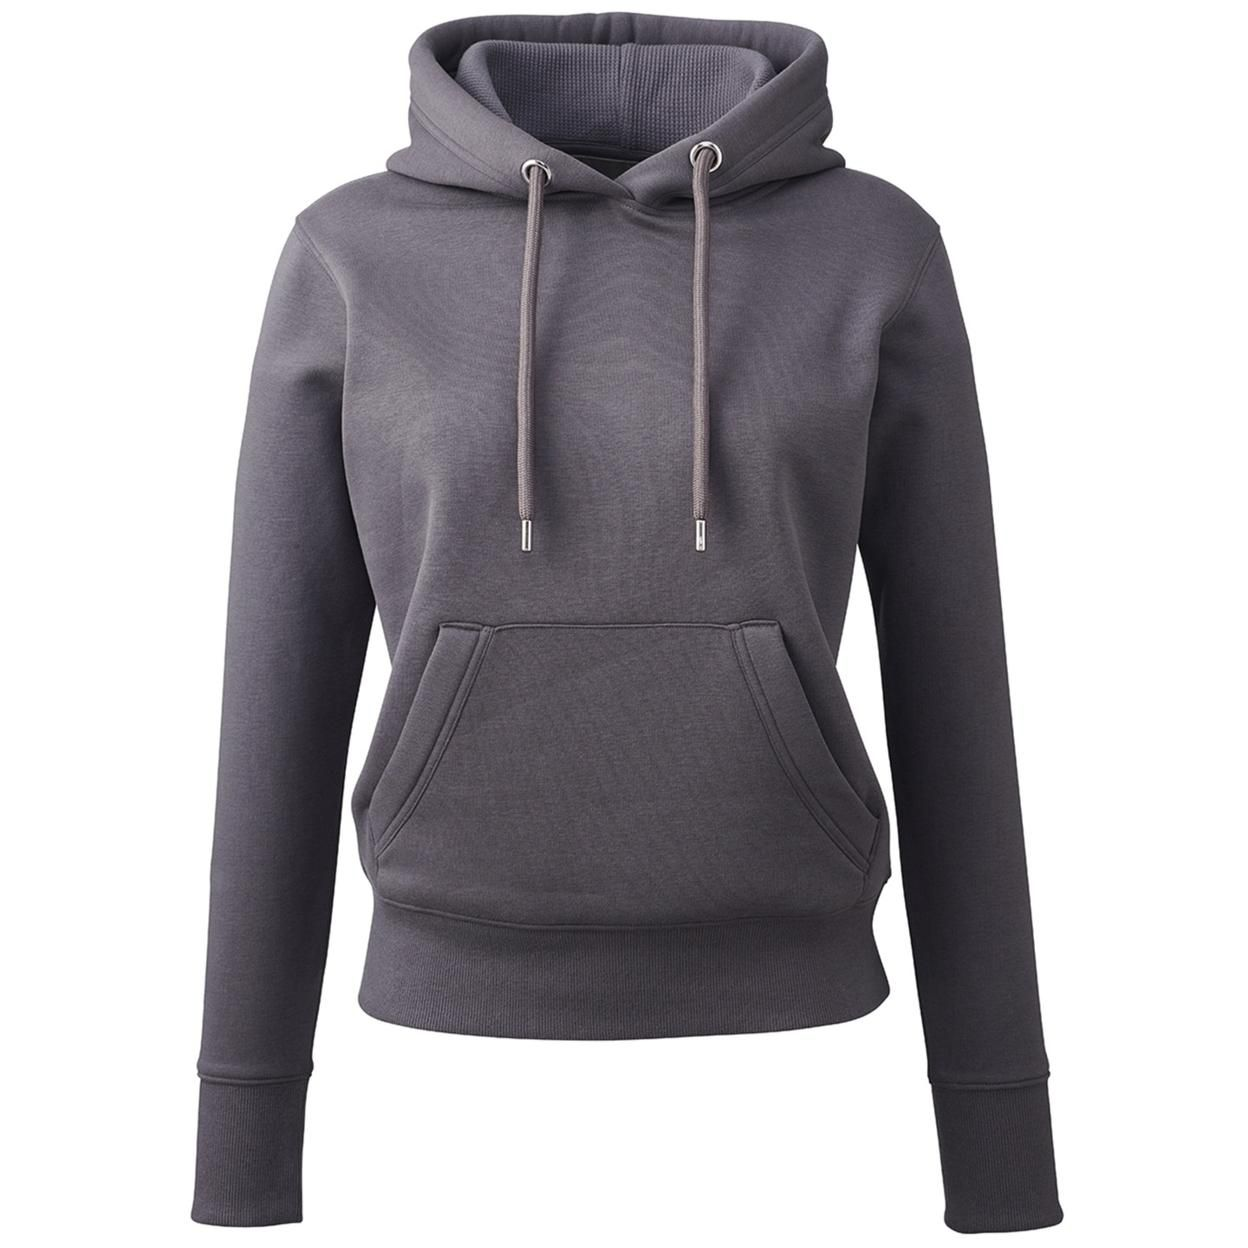 Anthem Womens/Ladies Organic Hoodie Size XS